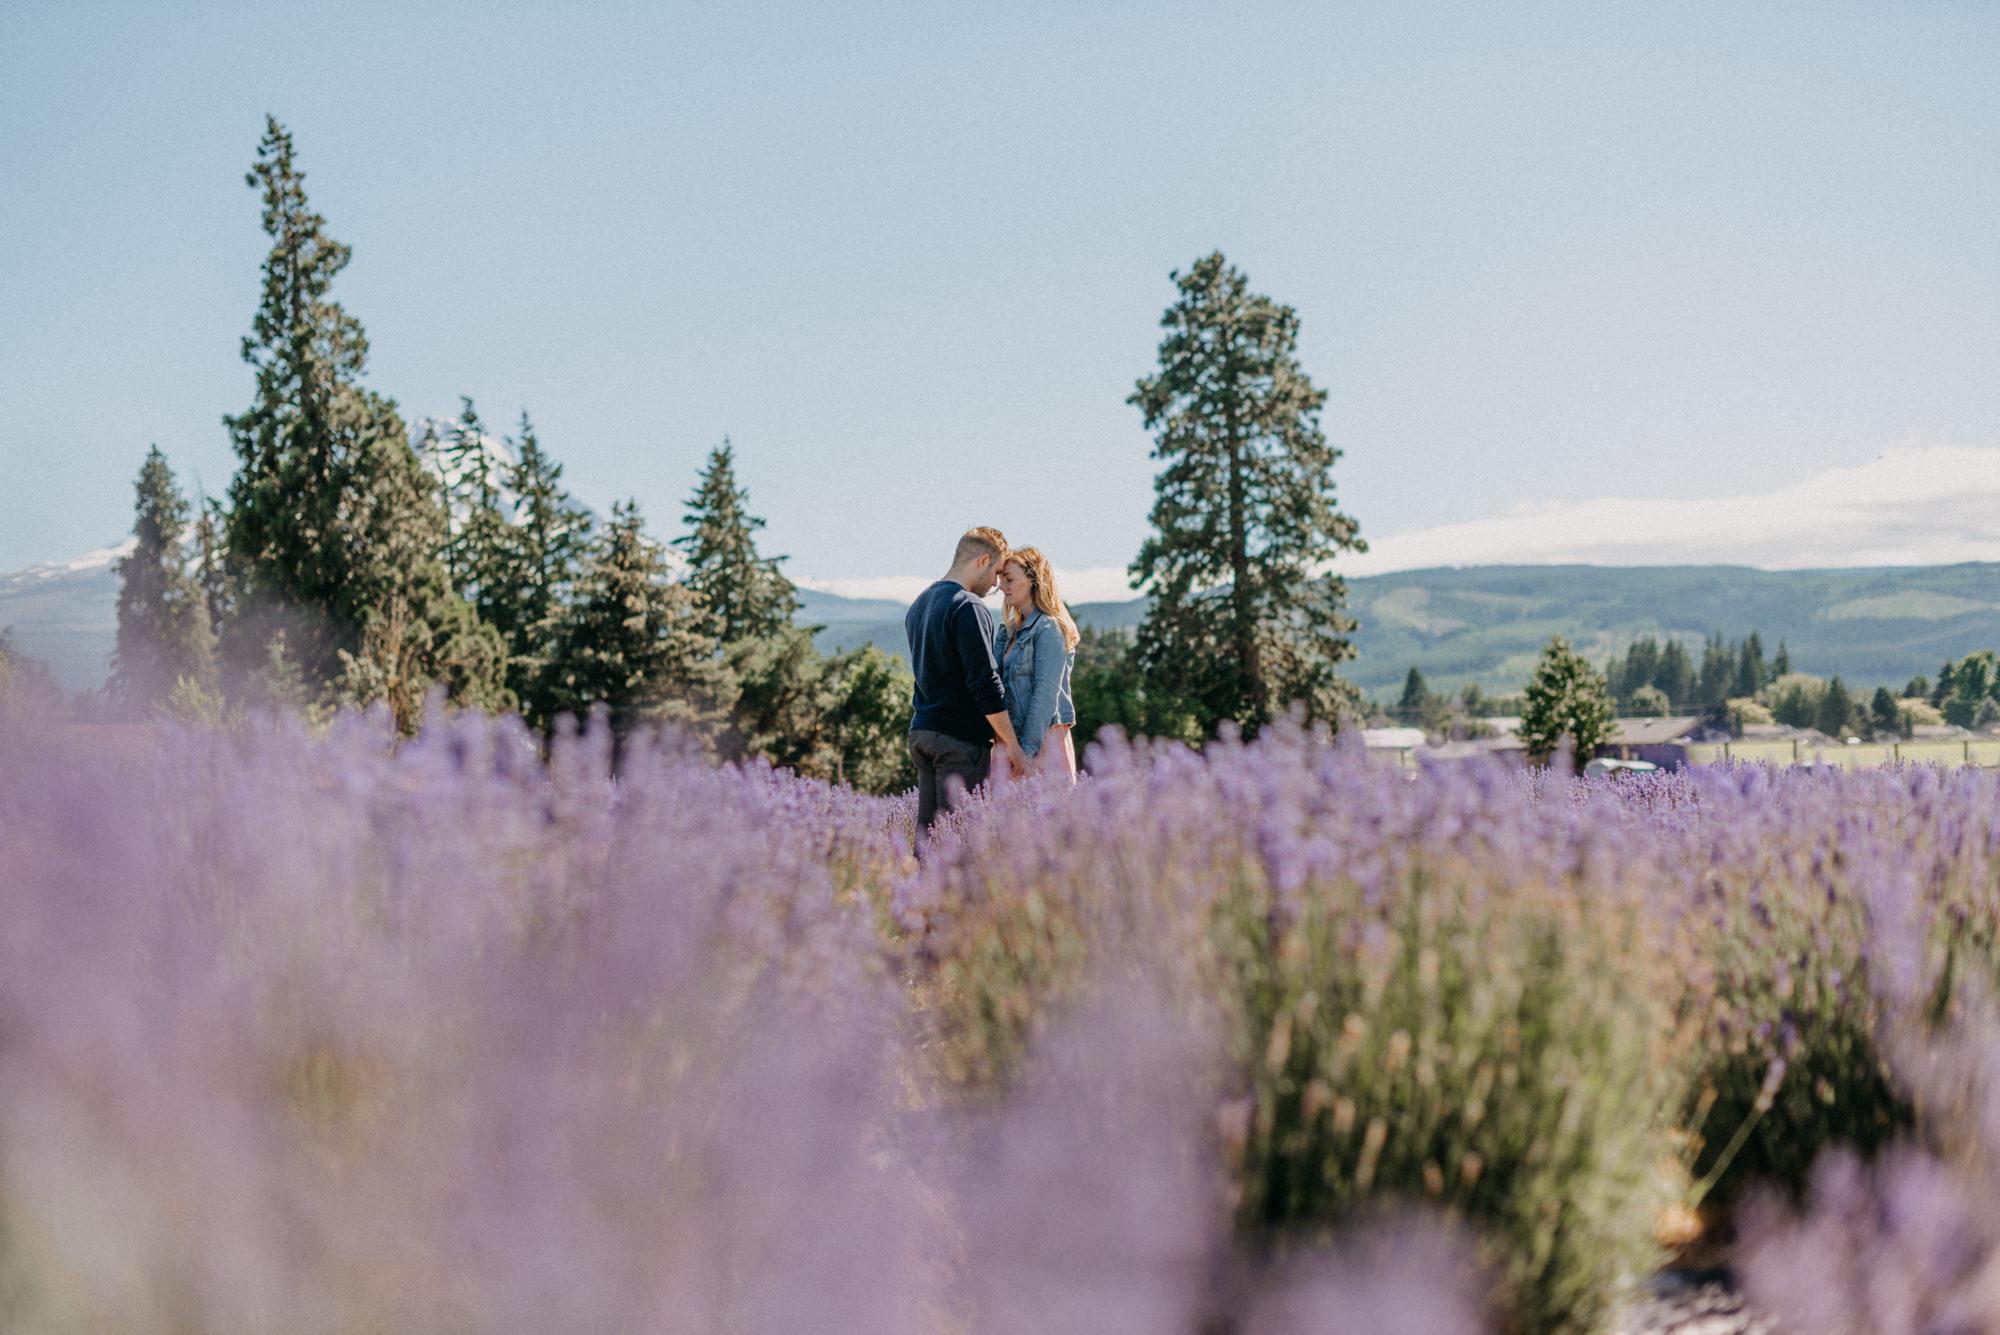 9-Mt-hood-lavender-farms-engagment-couple-summer-7149.jpg